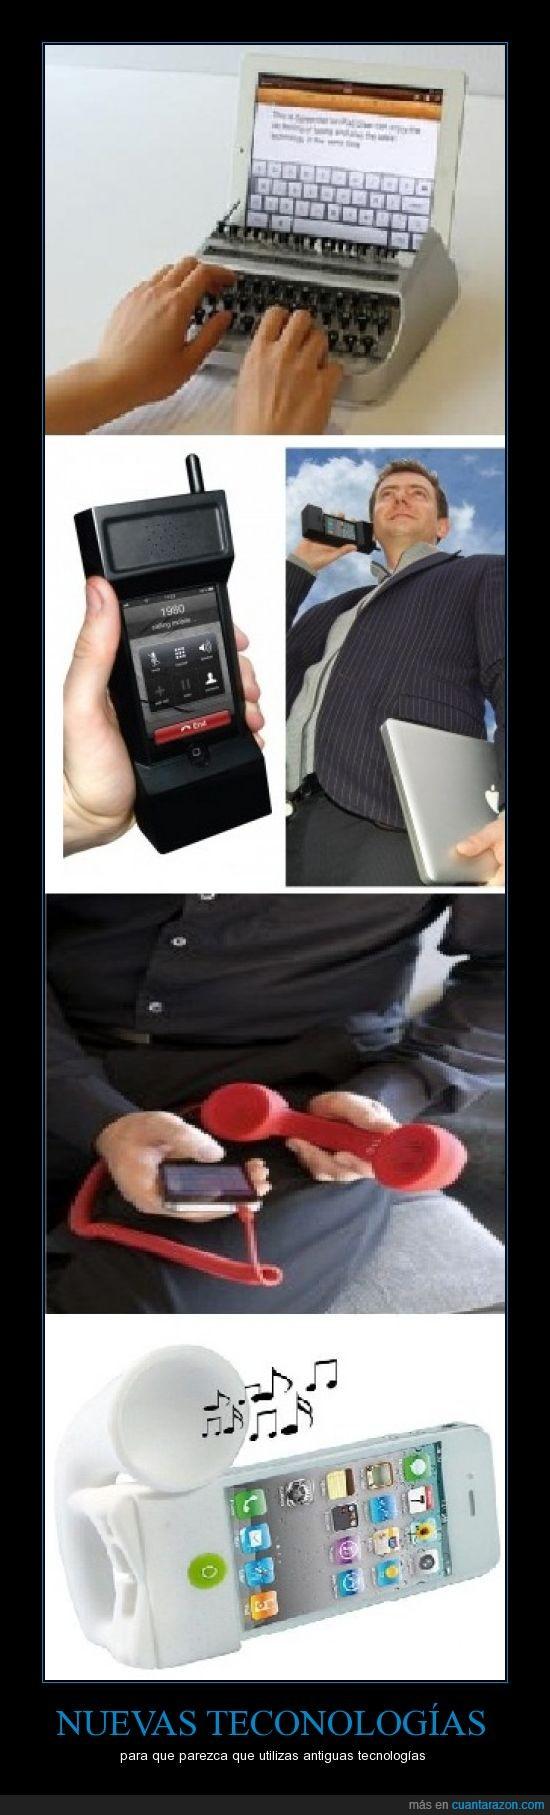 iphone,maquina de escribir,tecnologia,telefono,tocho